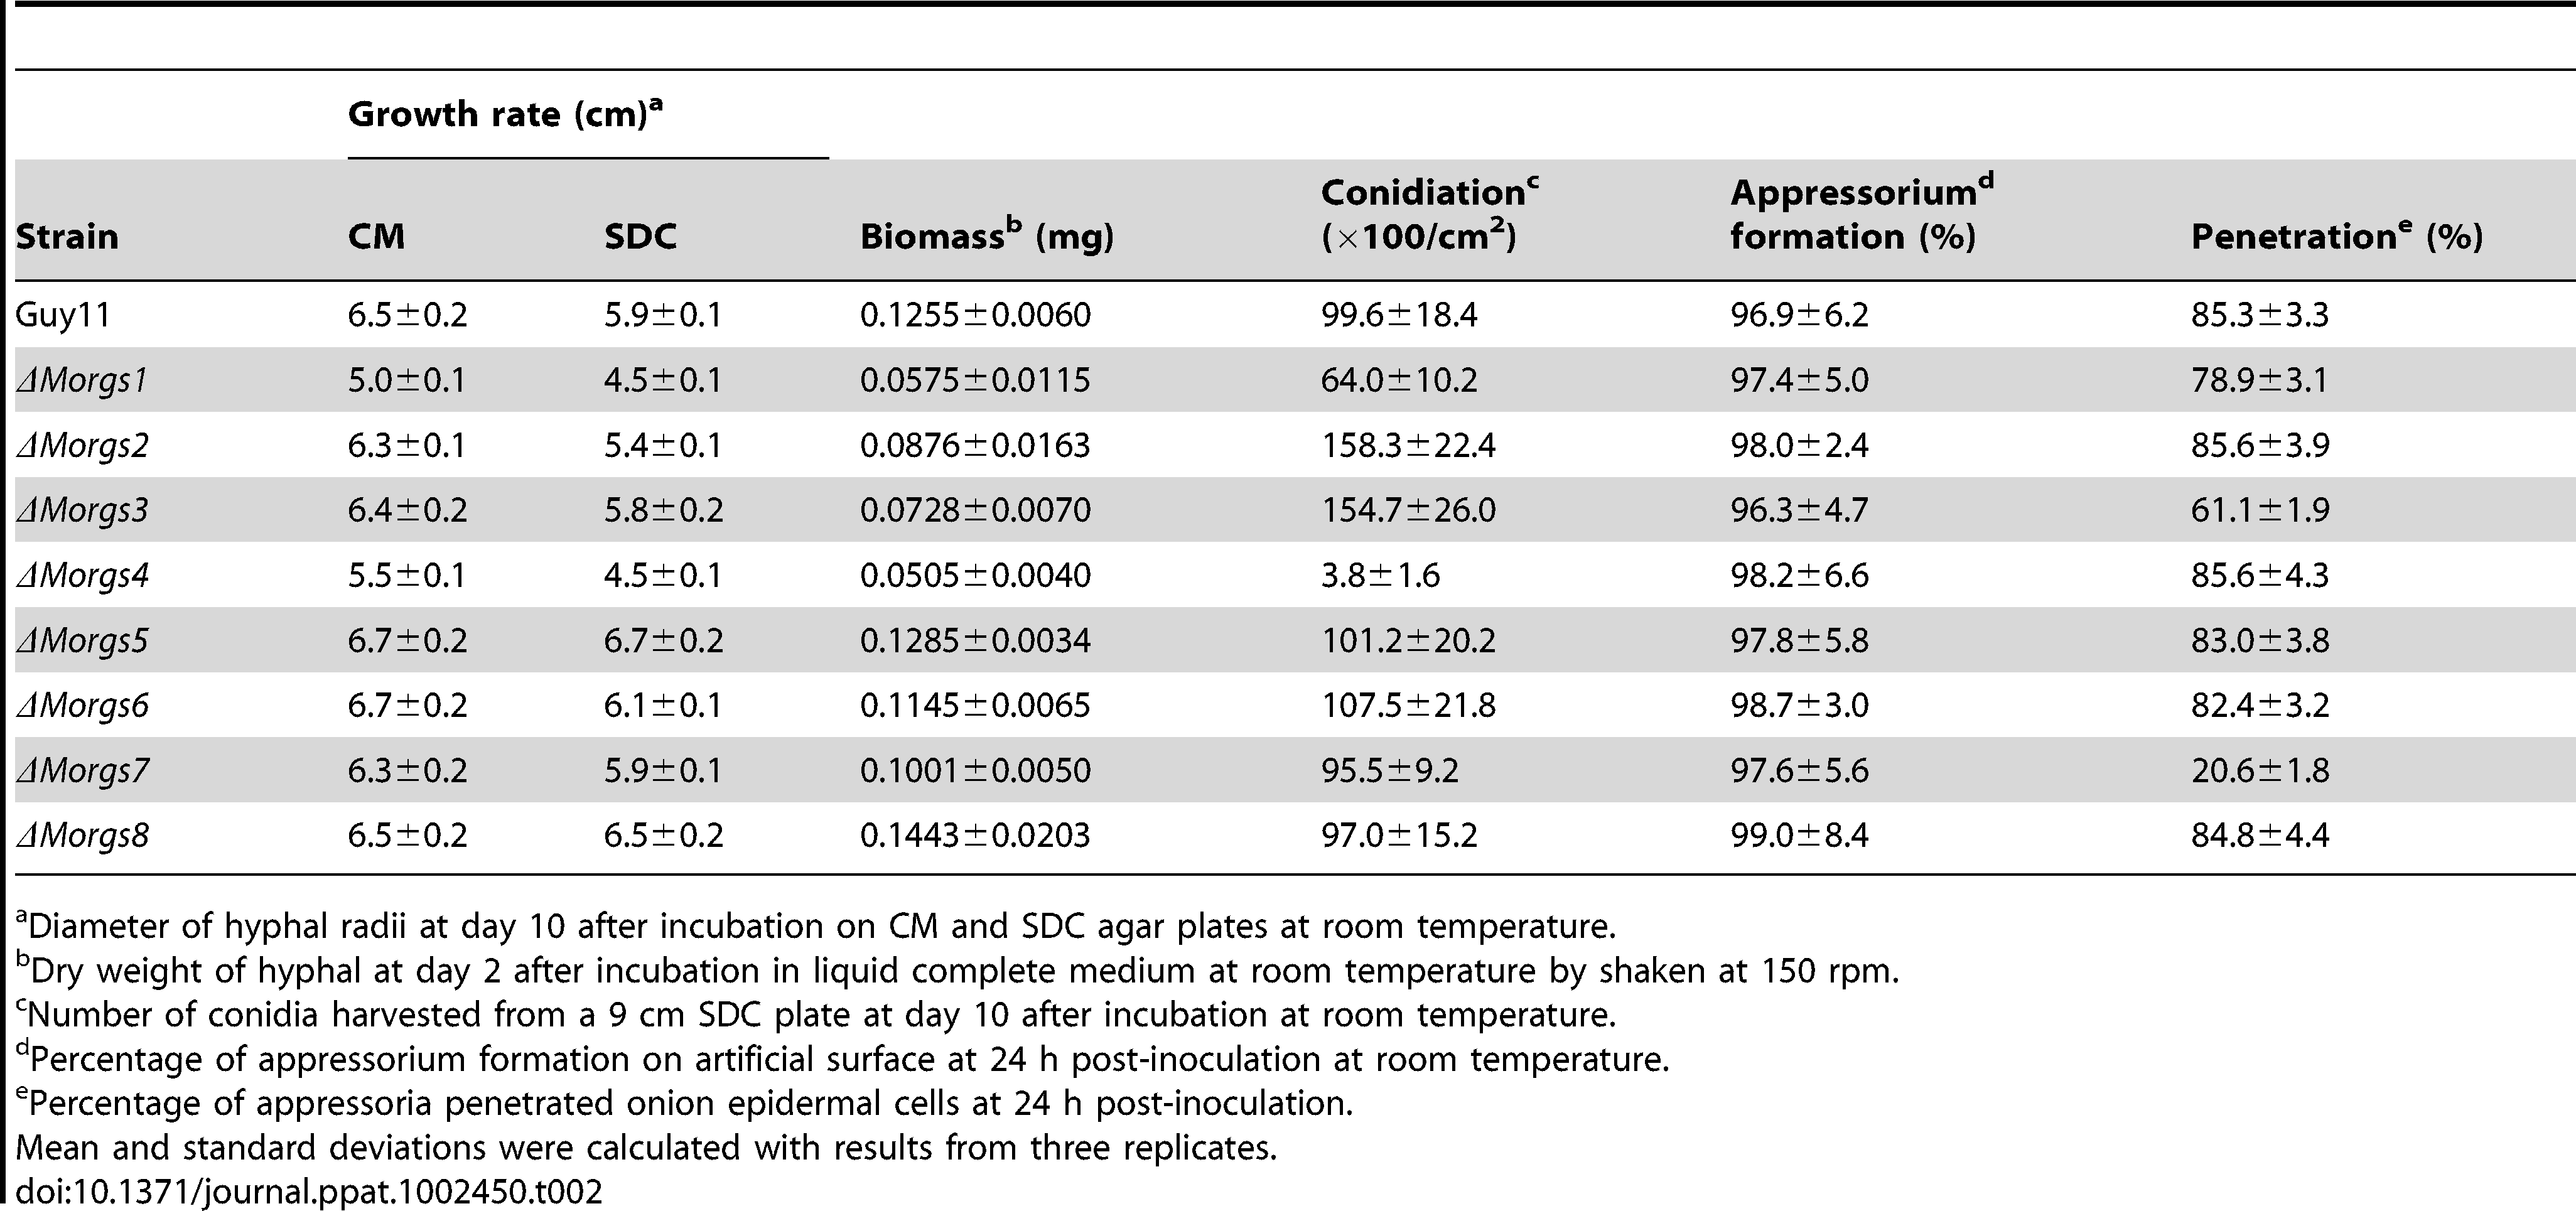 Comparison of mycological characteristics among strains.